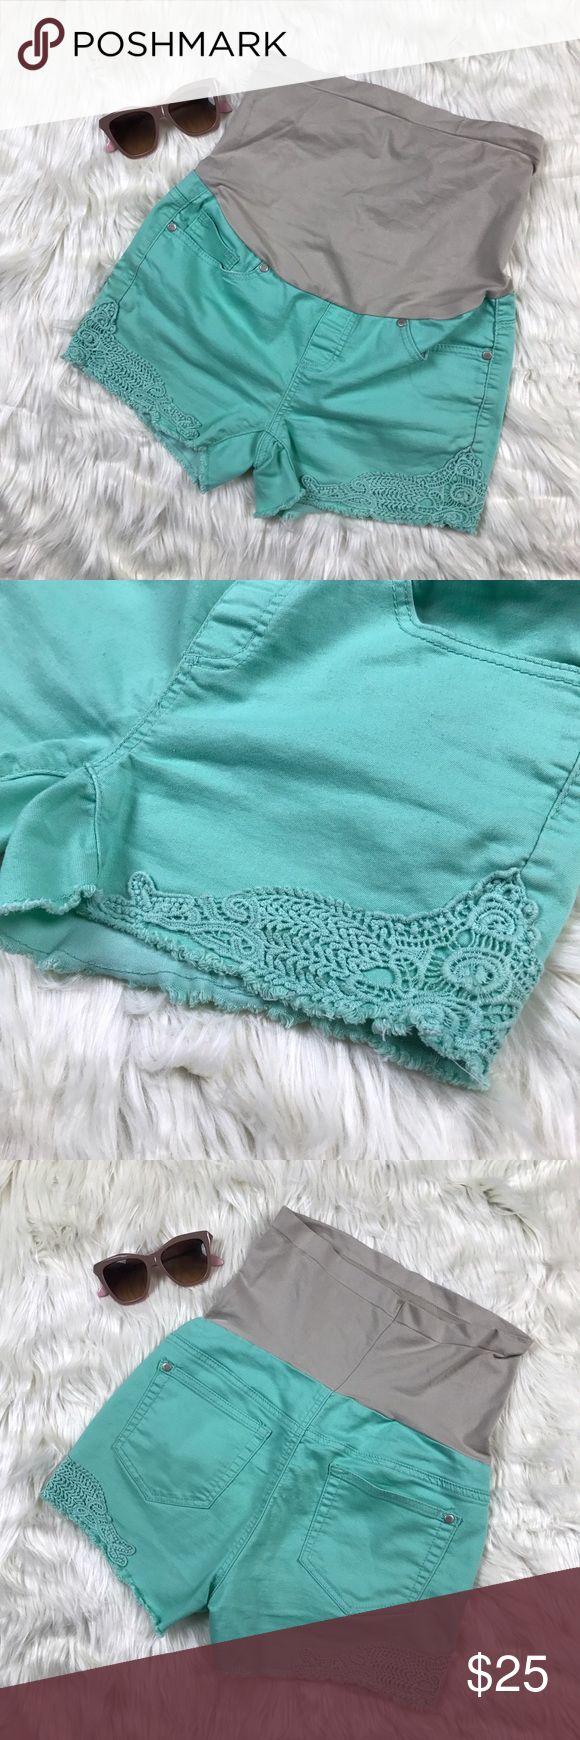 "Bella Vida Mint Green Maternity Shorts Lace Jeans Belly: 9.5"" Waist: 31"" Length: 9.5"" Rise: 6"" Bella Vida Shorts Jean Shorts"